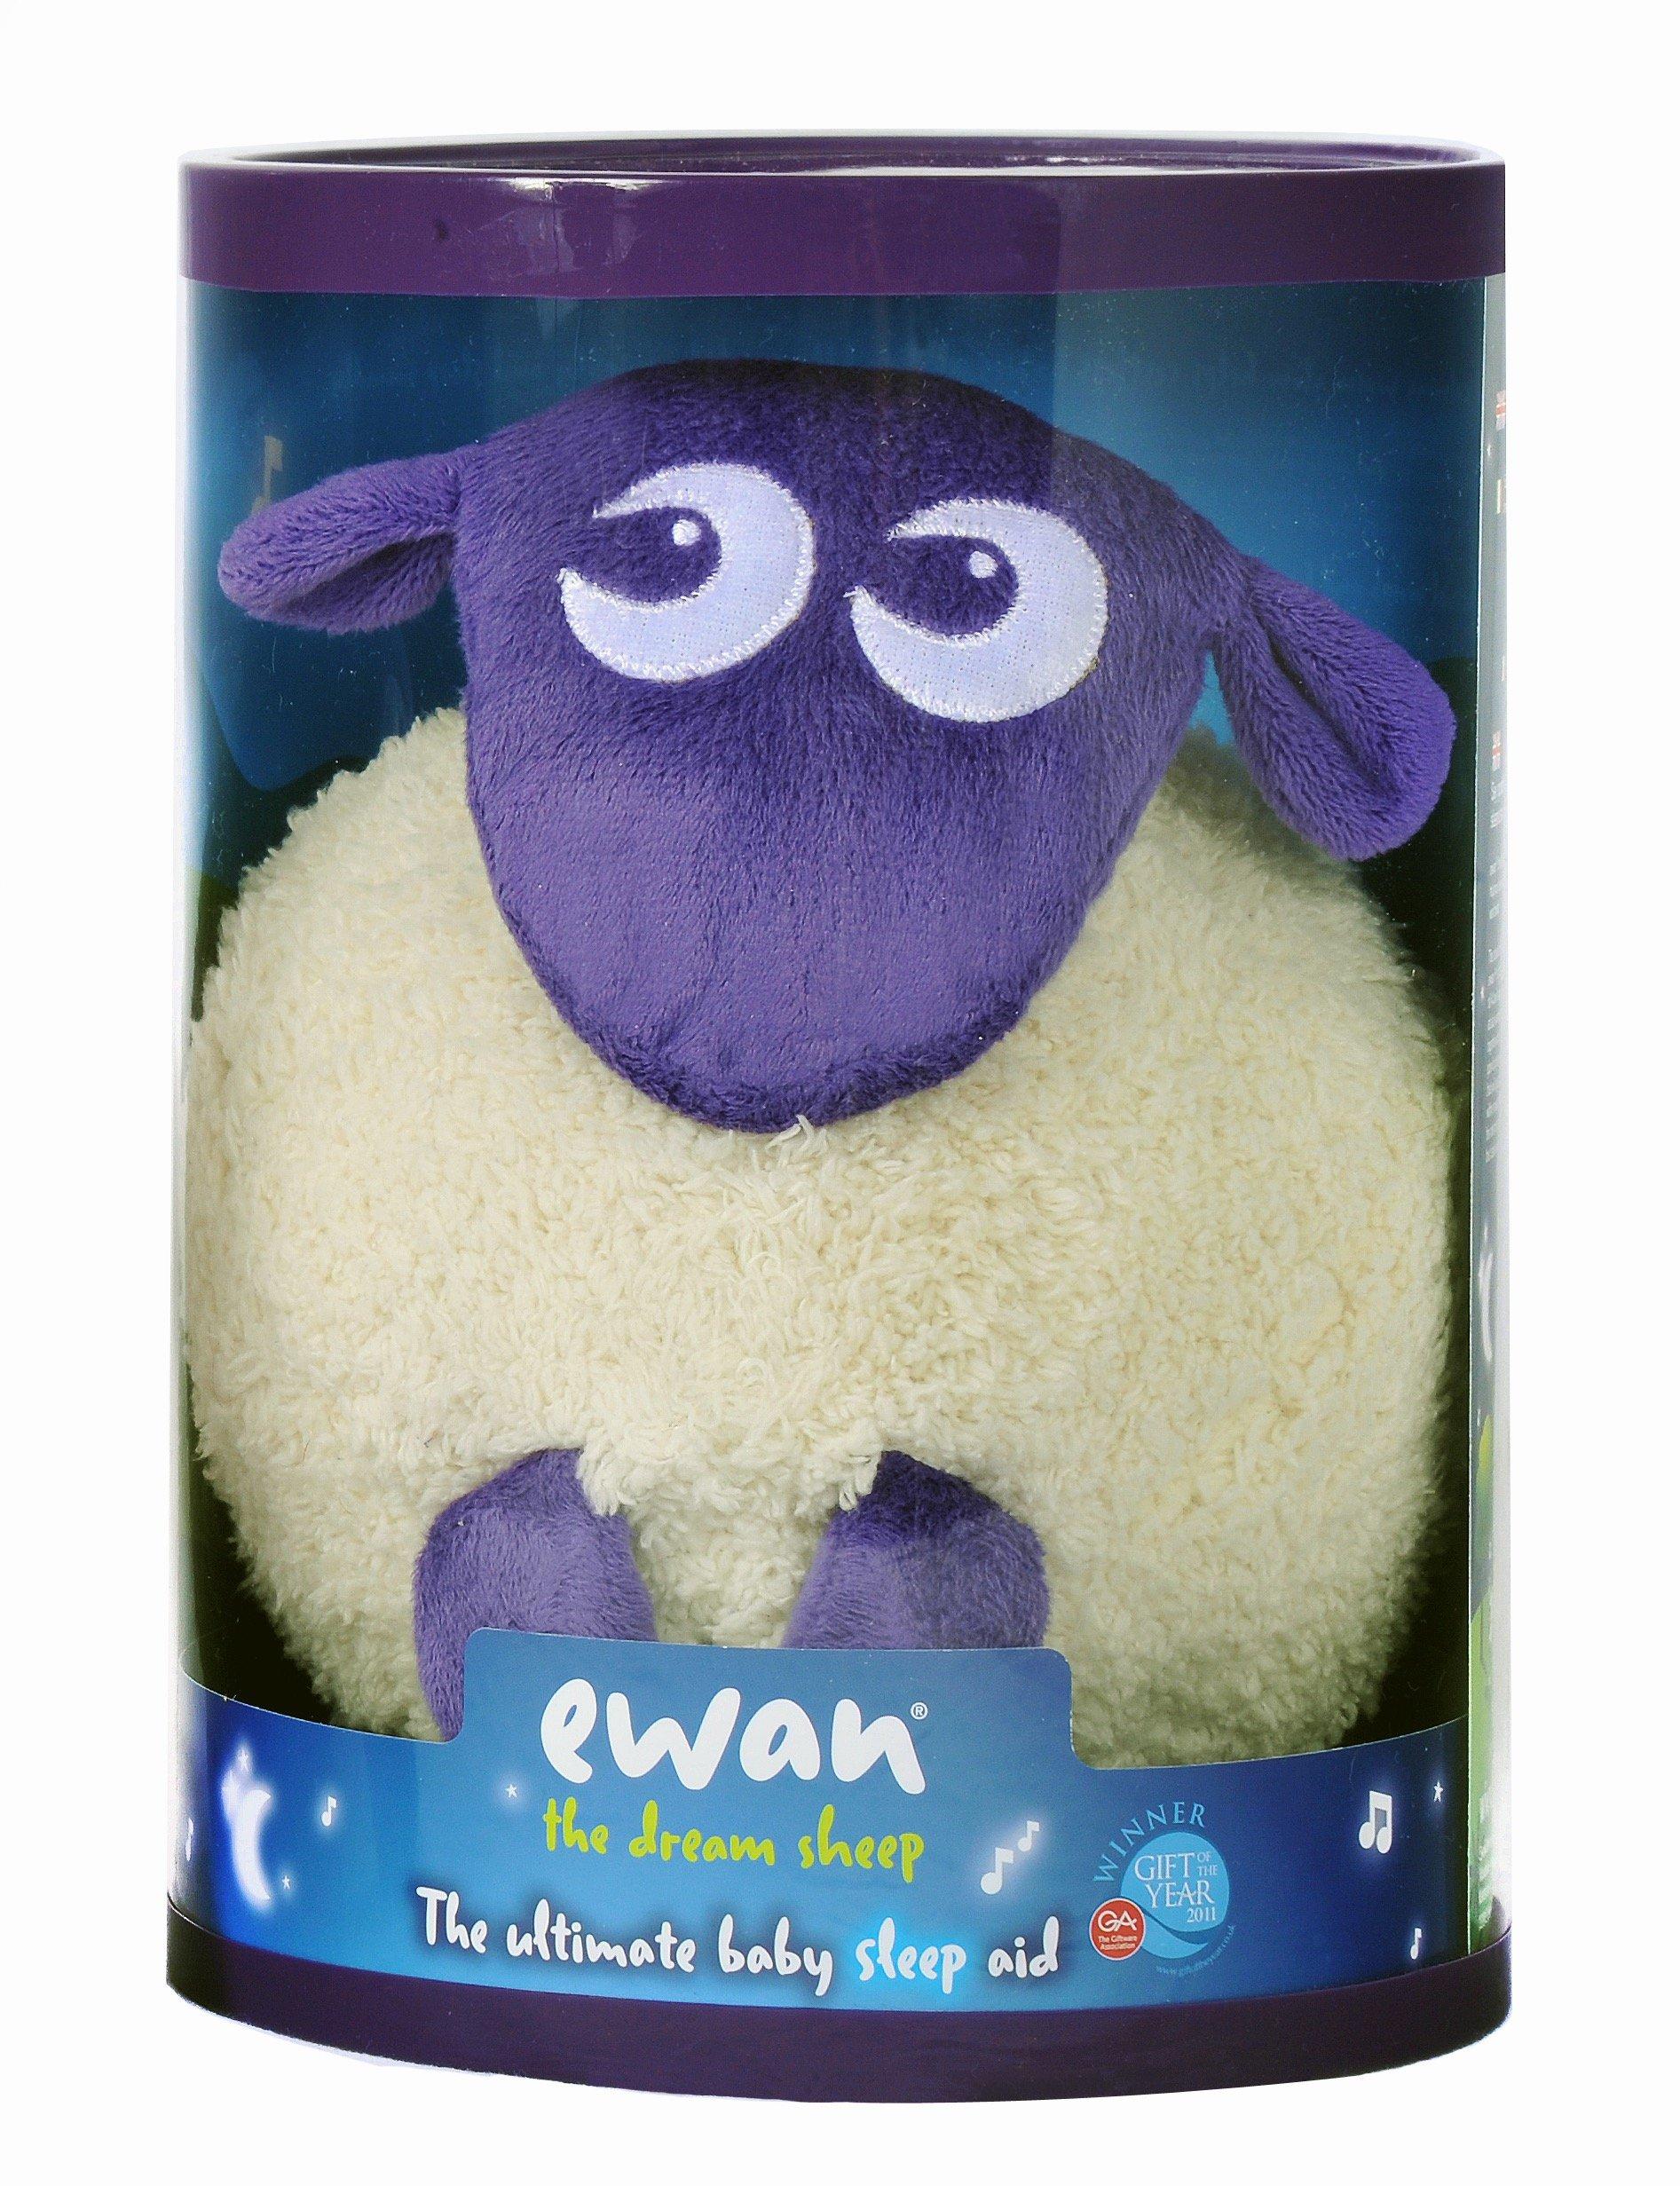 SweetDreamers ewan the dream sheep - purple 2